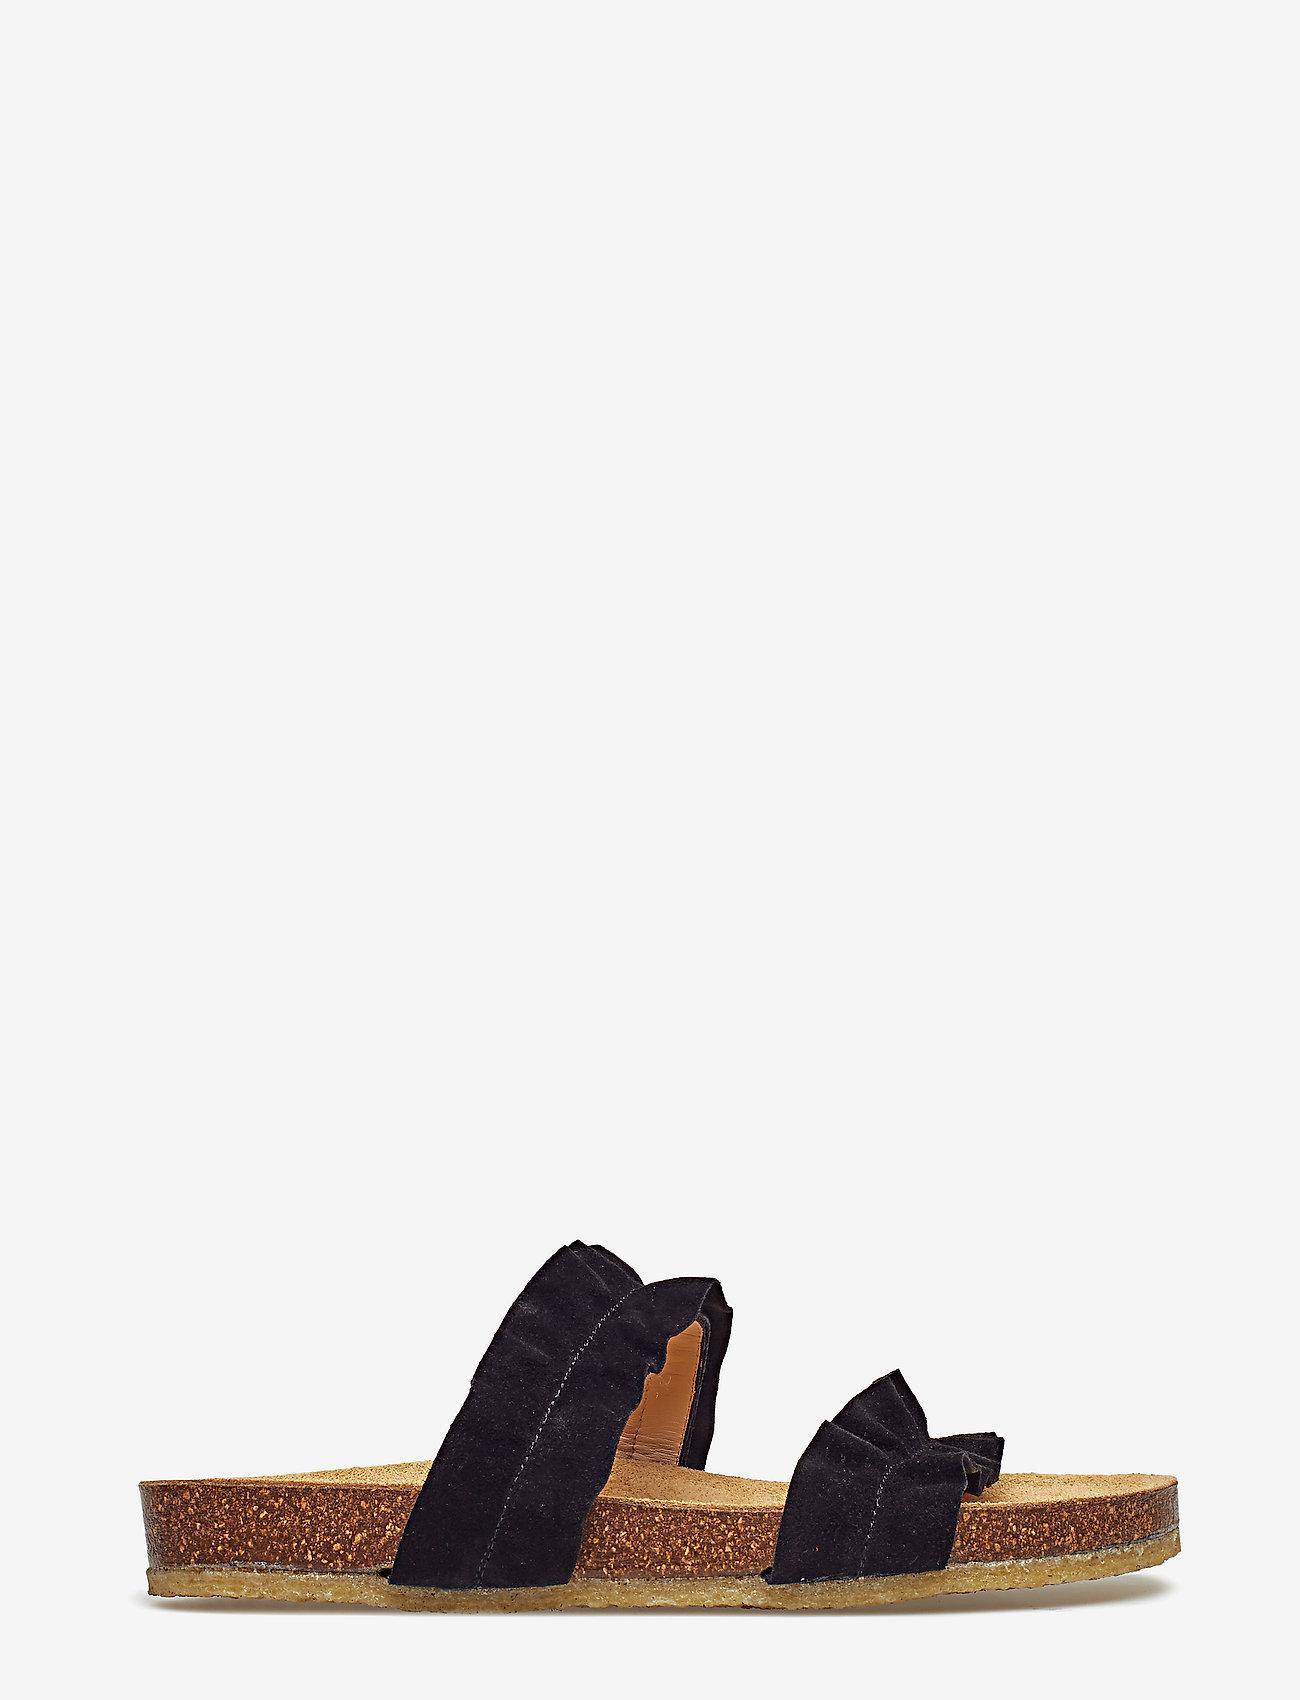 ANGULUS - Sandals - flat - open toe - op - flade sandaler - 1163 black - 1